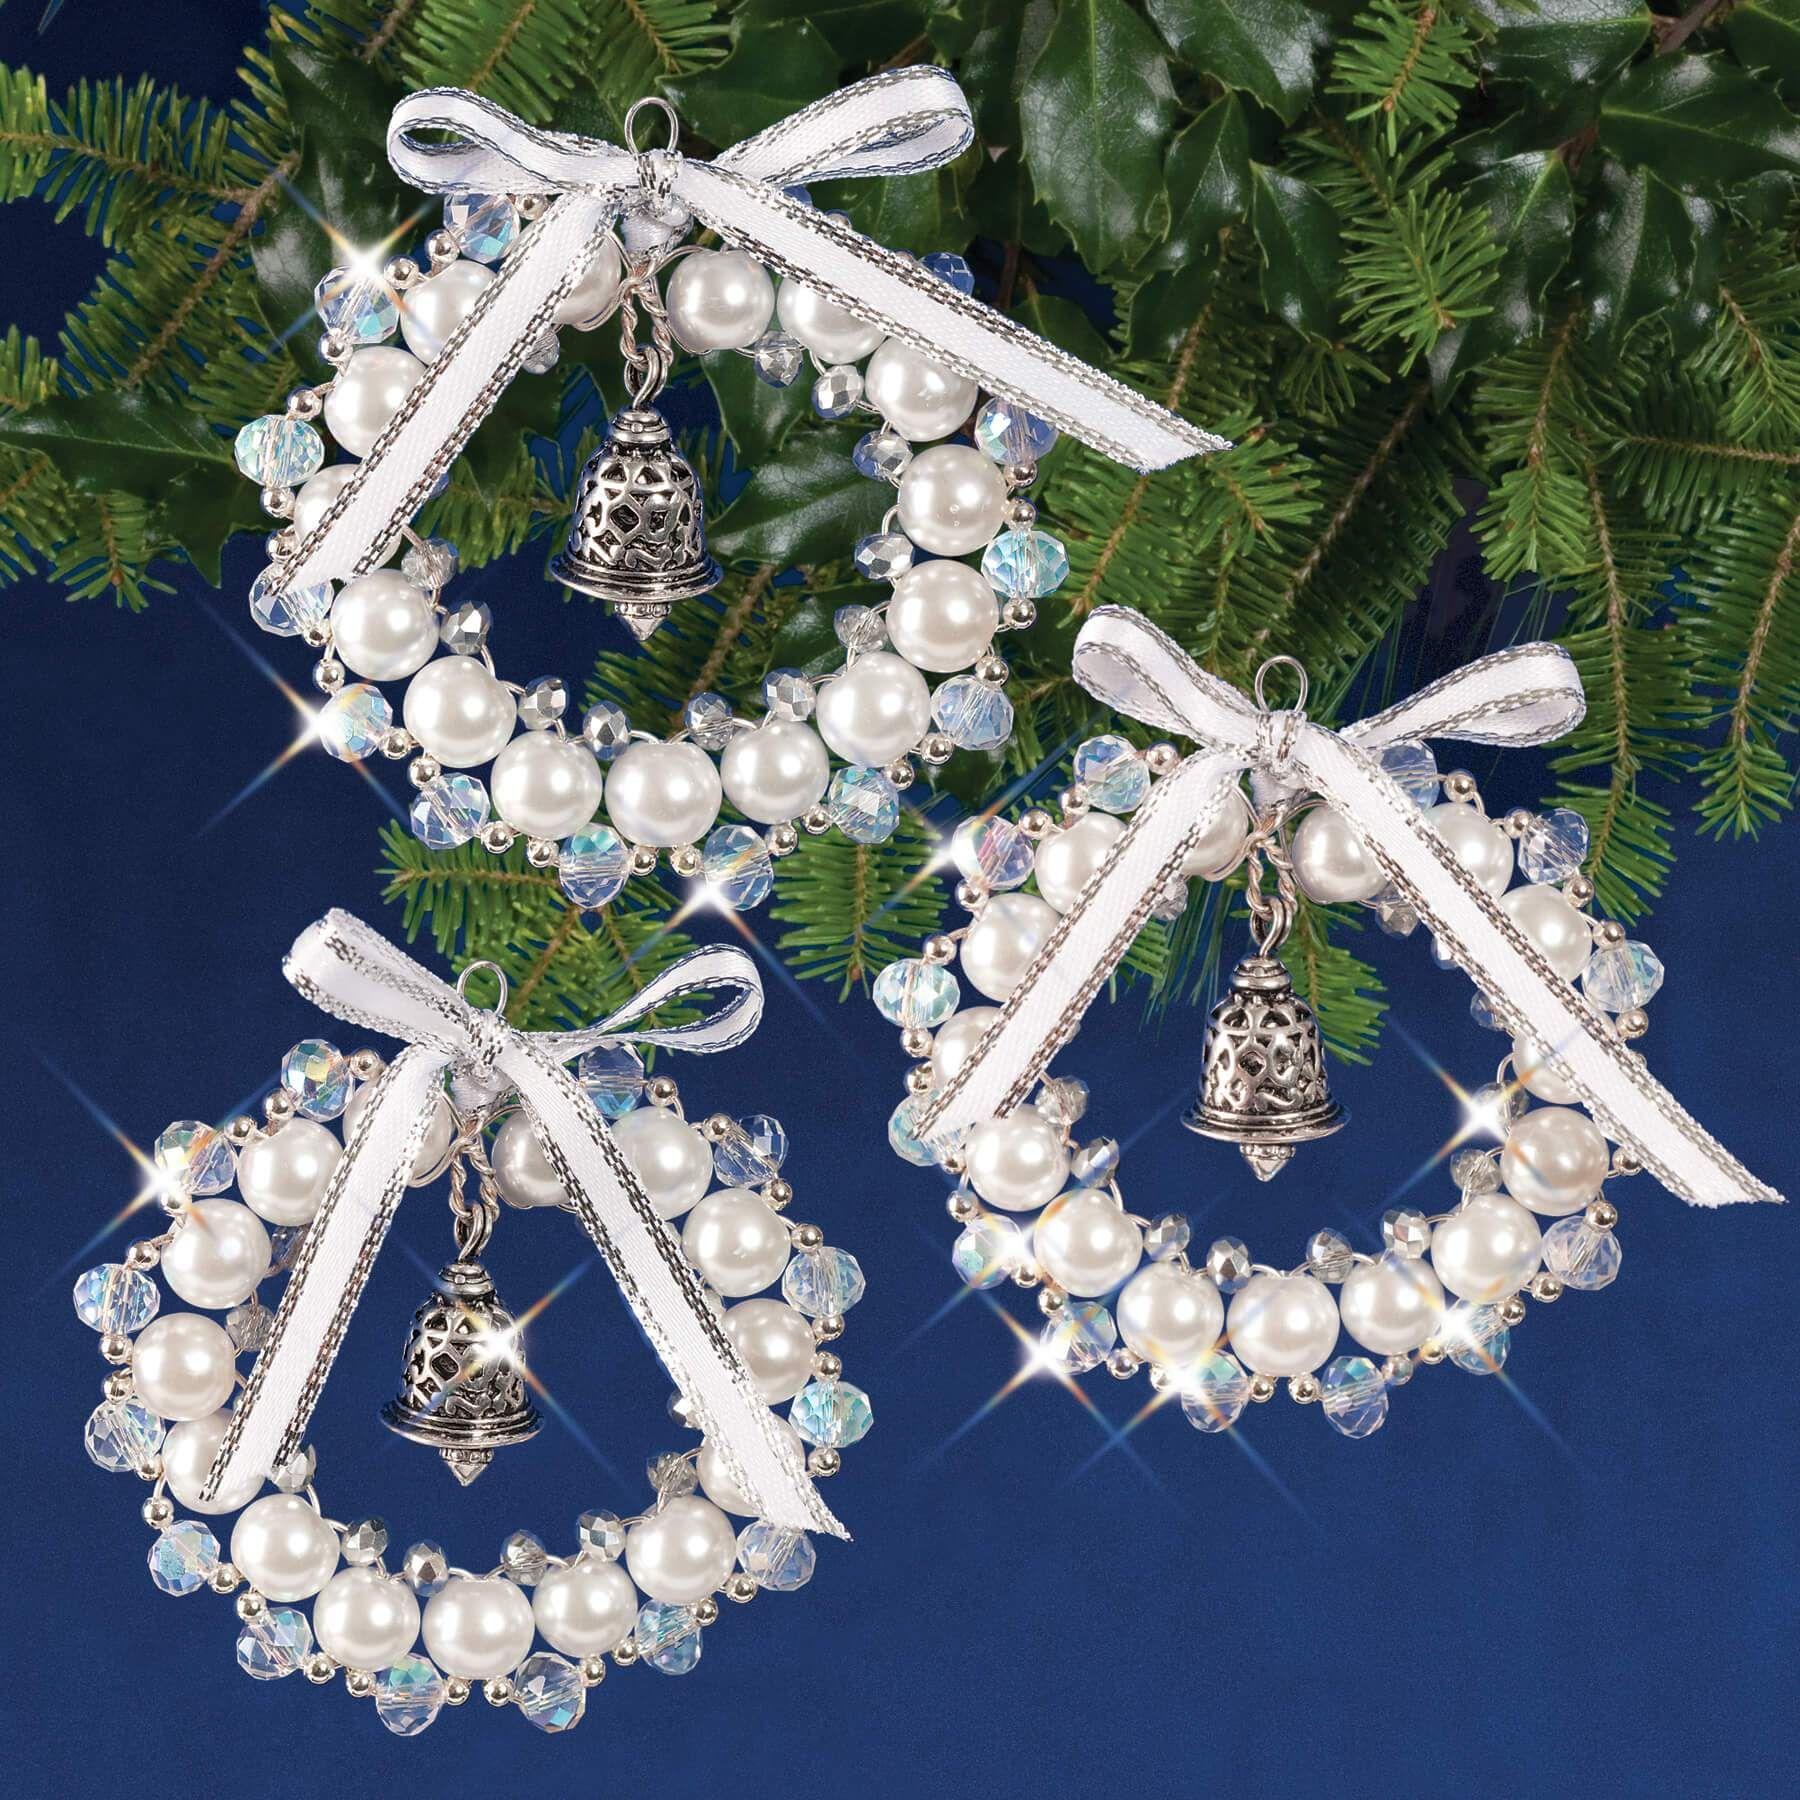 Nostalgic Christmas Ornament Kit Silver Wreaths Christmas Ornaments Beaded Christmas Ornaments Christmas Bead